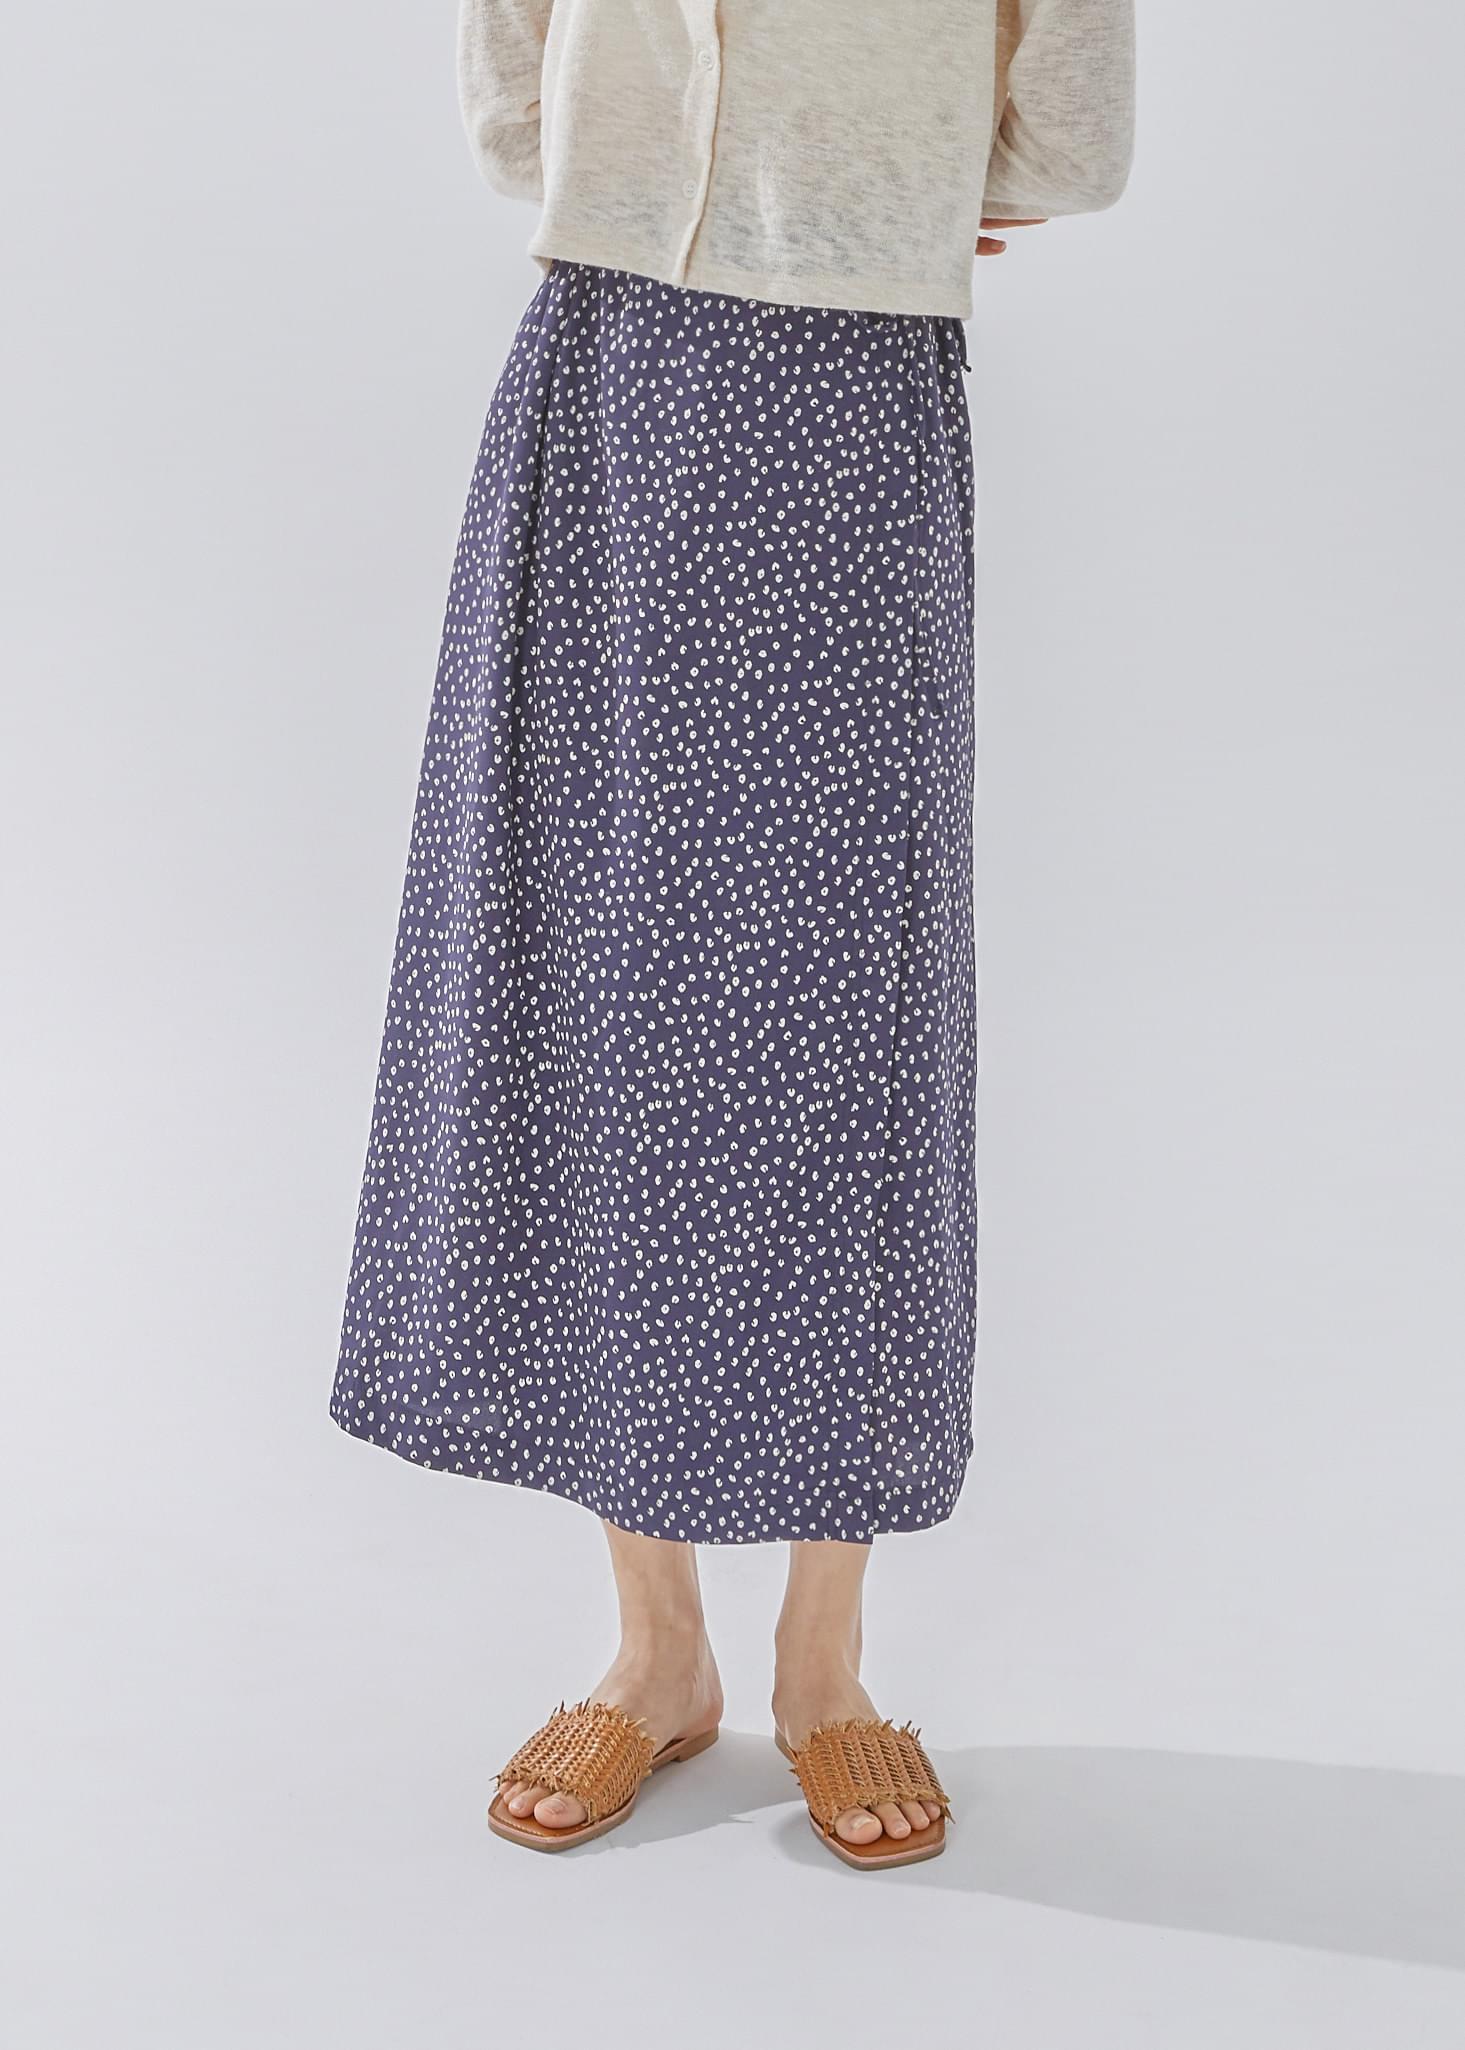 Opening Lab Skirt